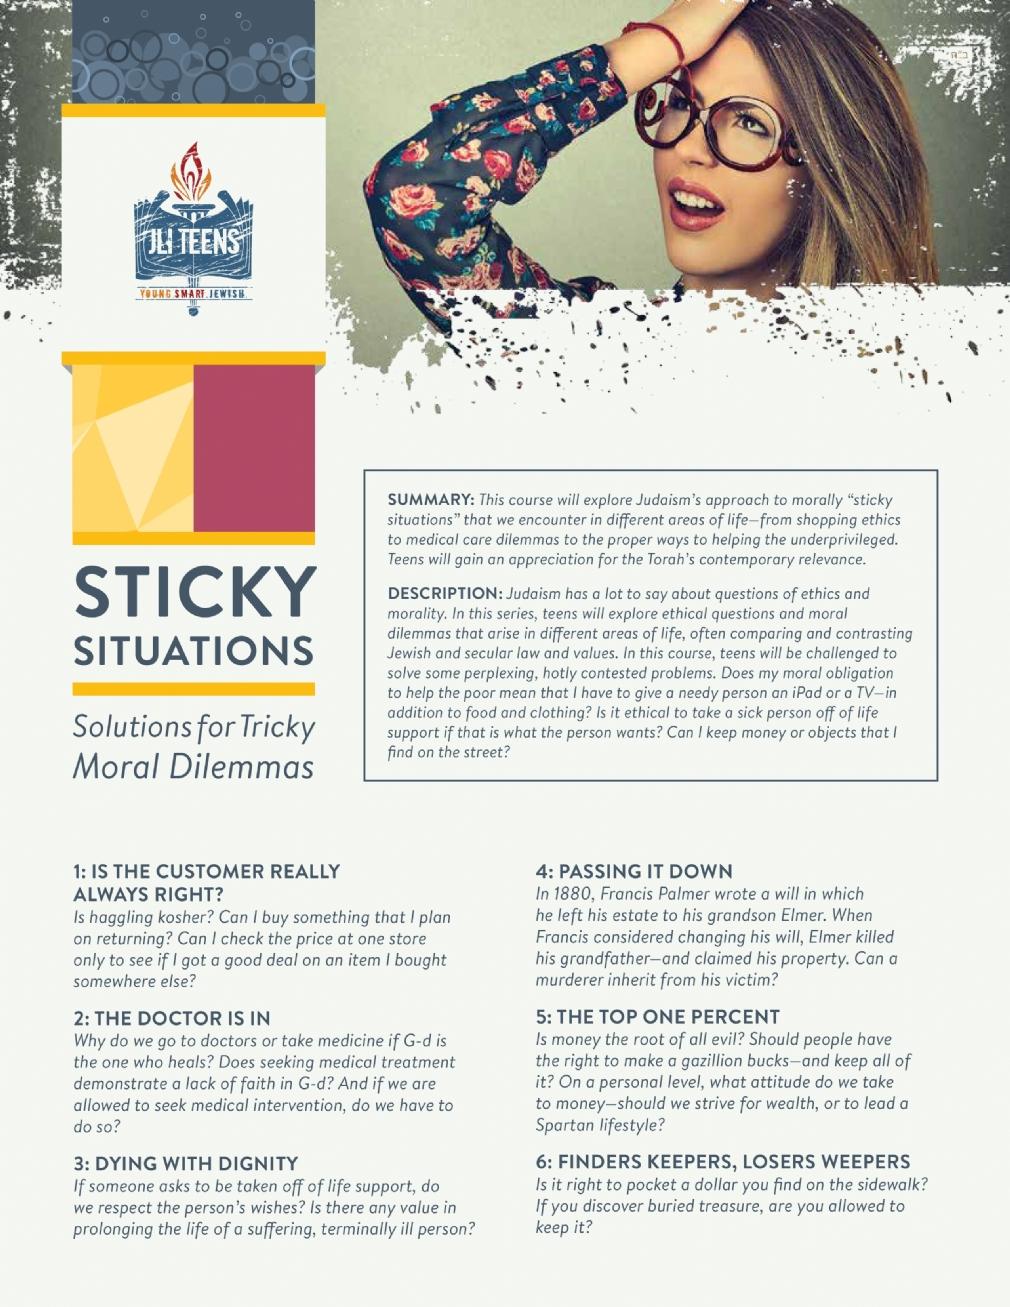 stickysituations.jpg